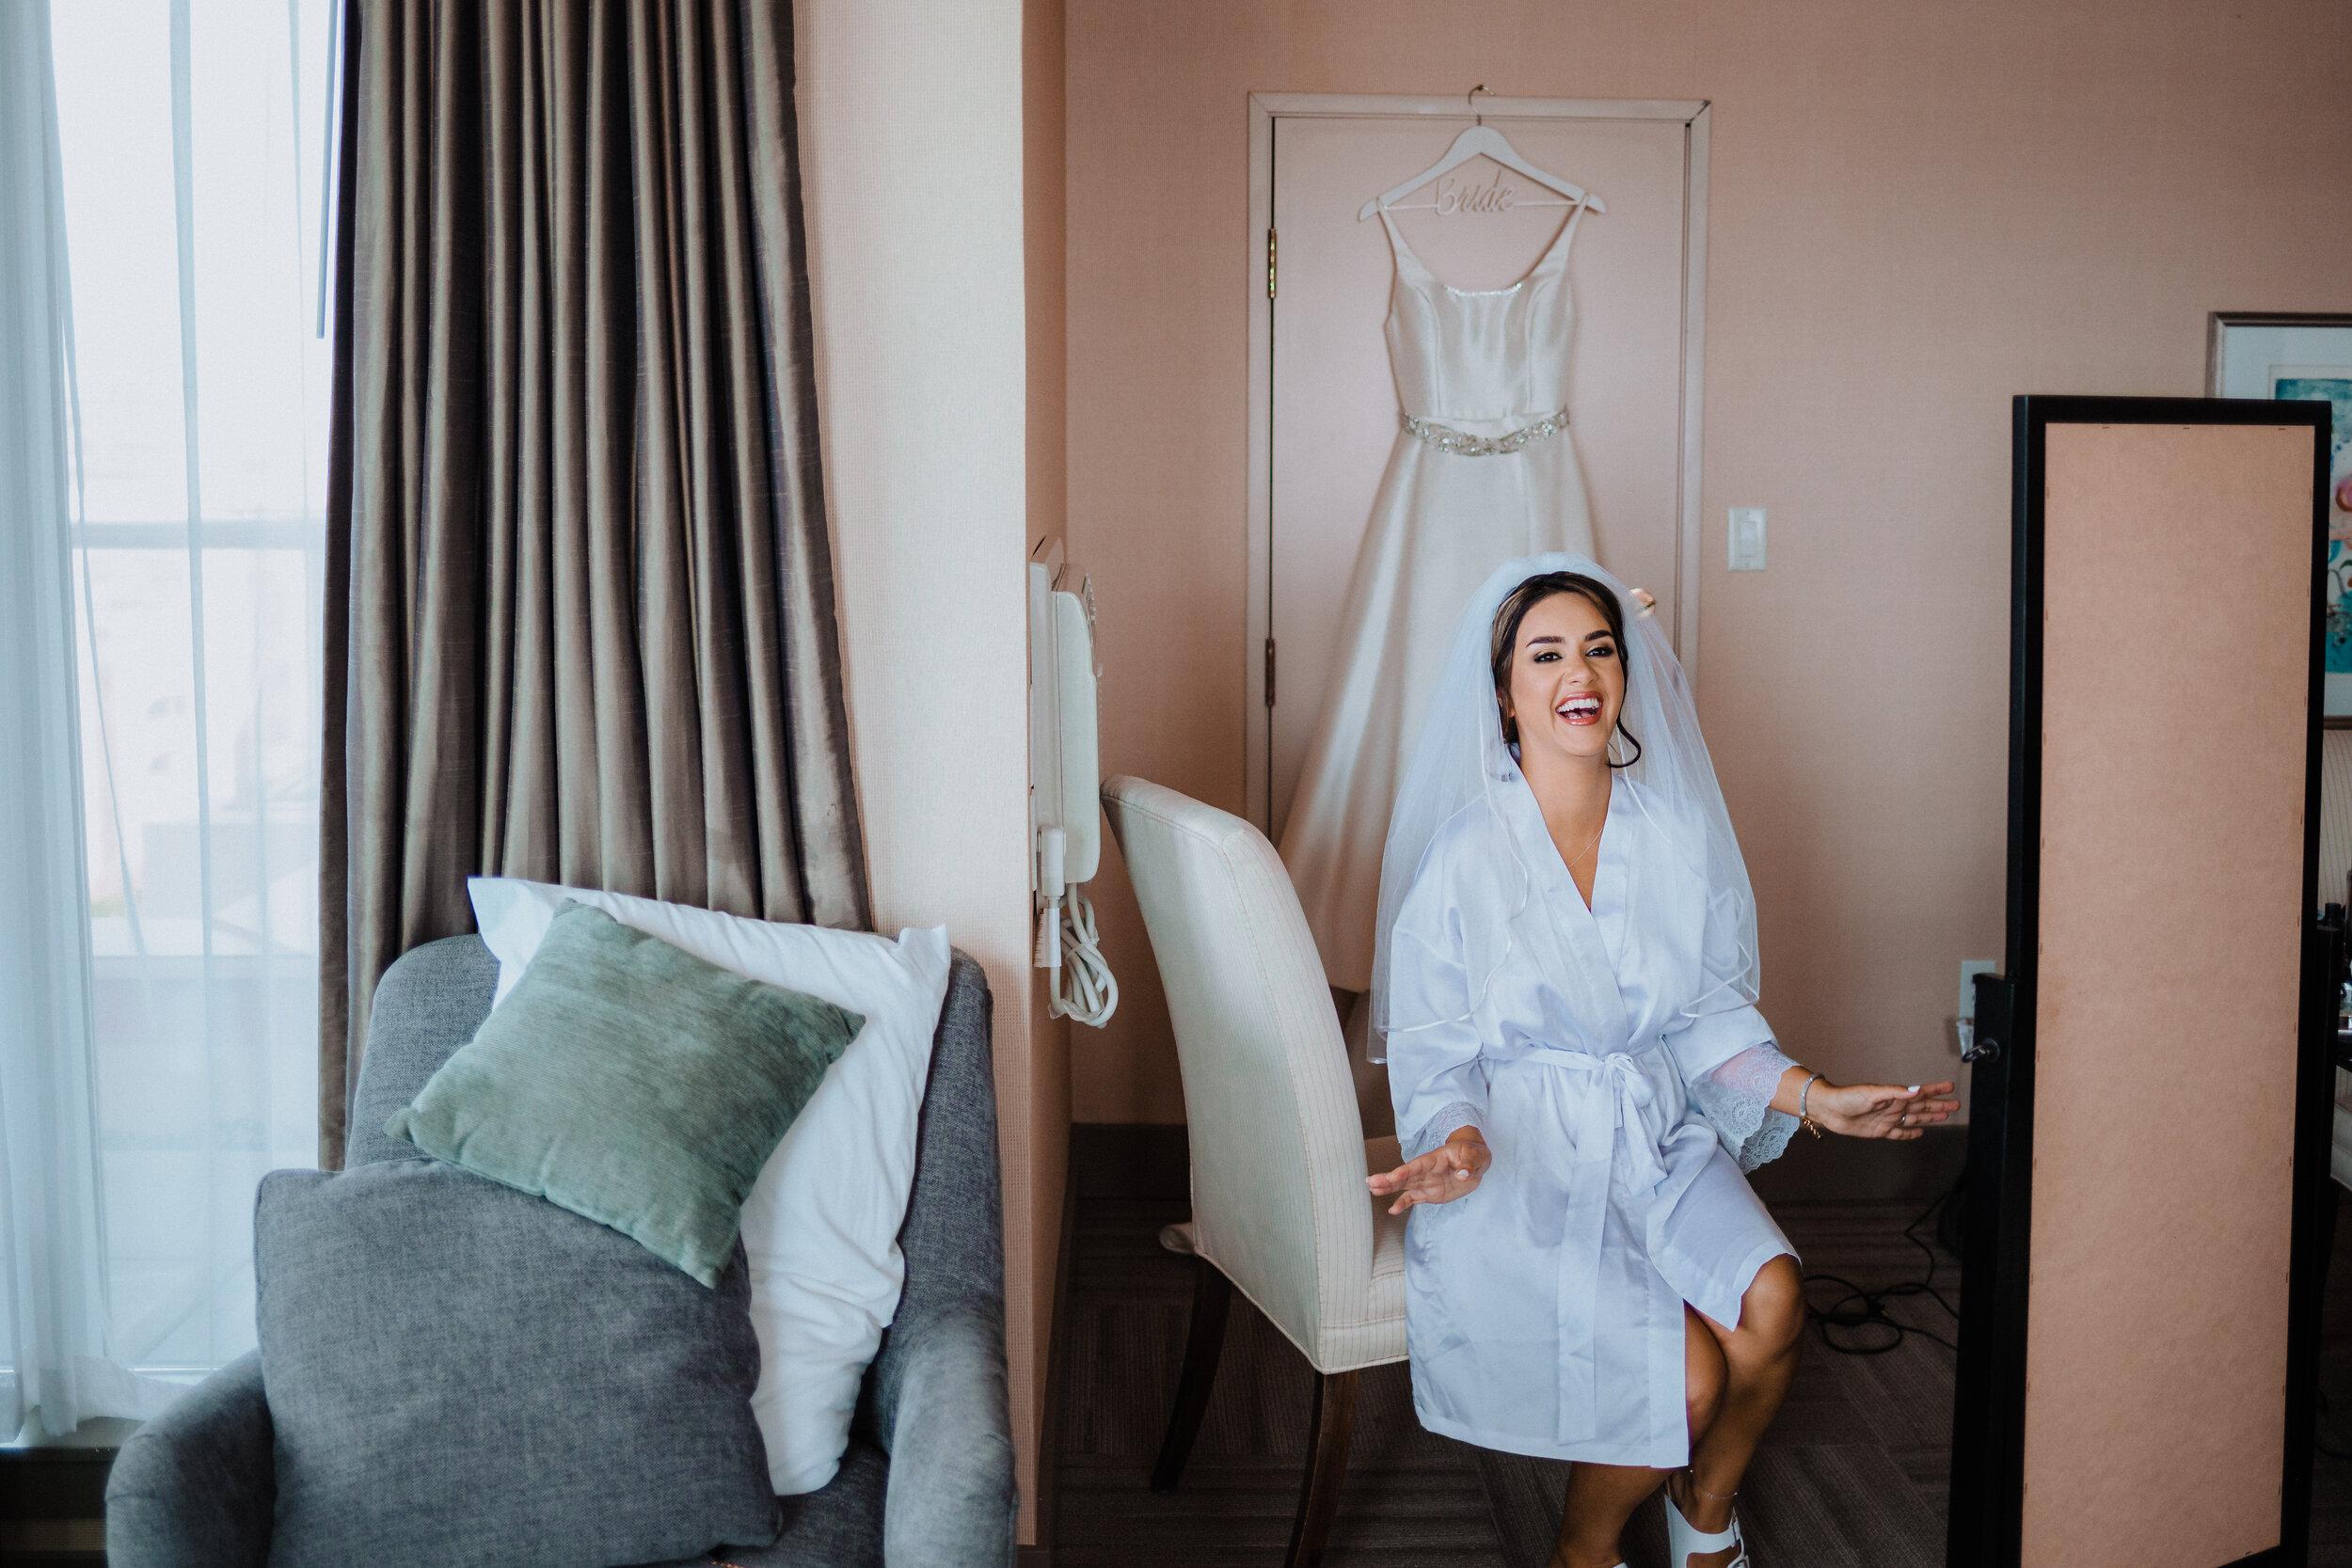 bridal suite at costal victoria hotel and marina - megan maundrell photography